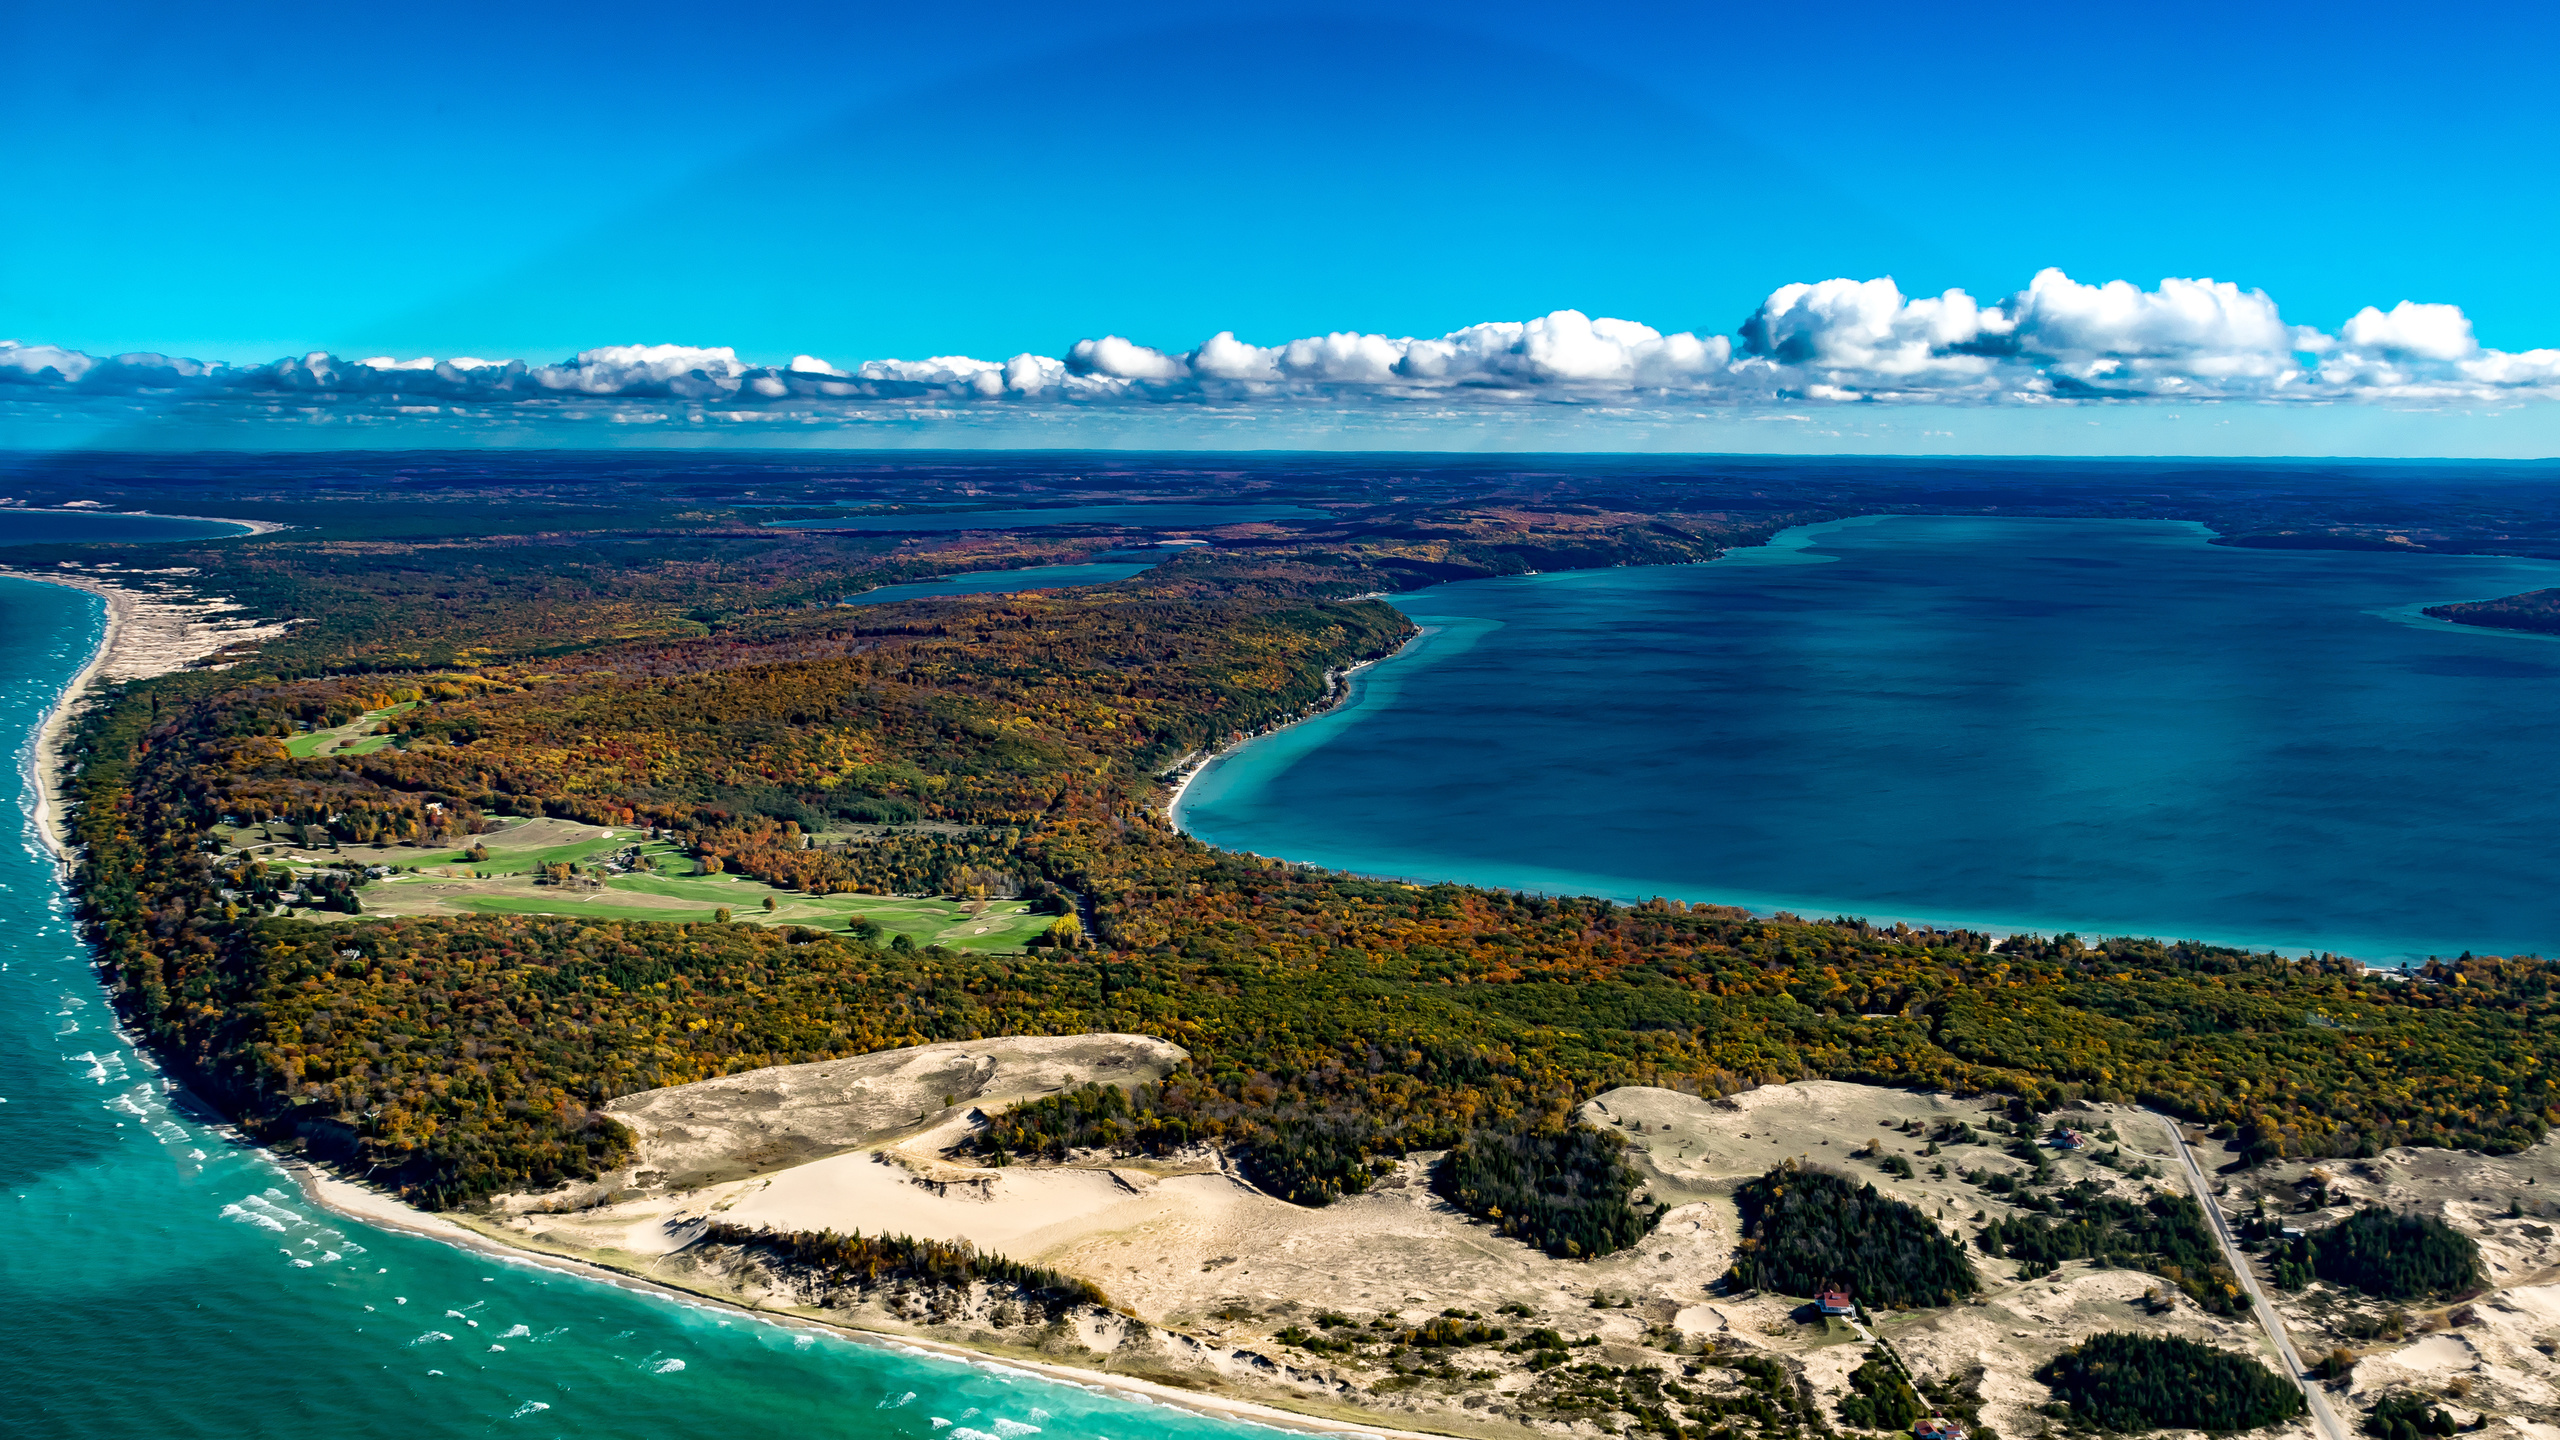 пейзаж, озеро, побережье, crystal lake, michigan, природа